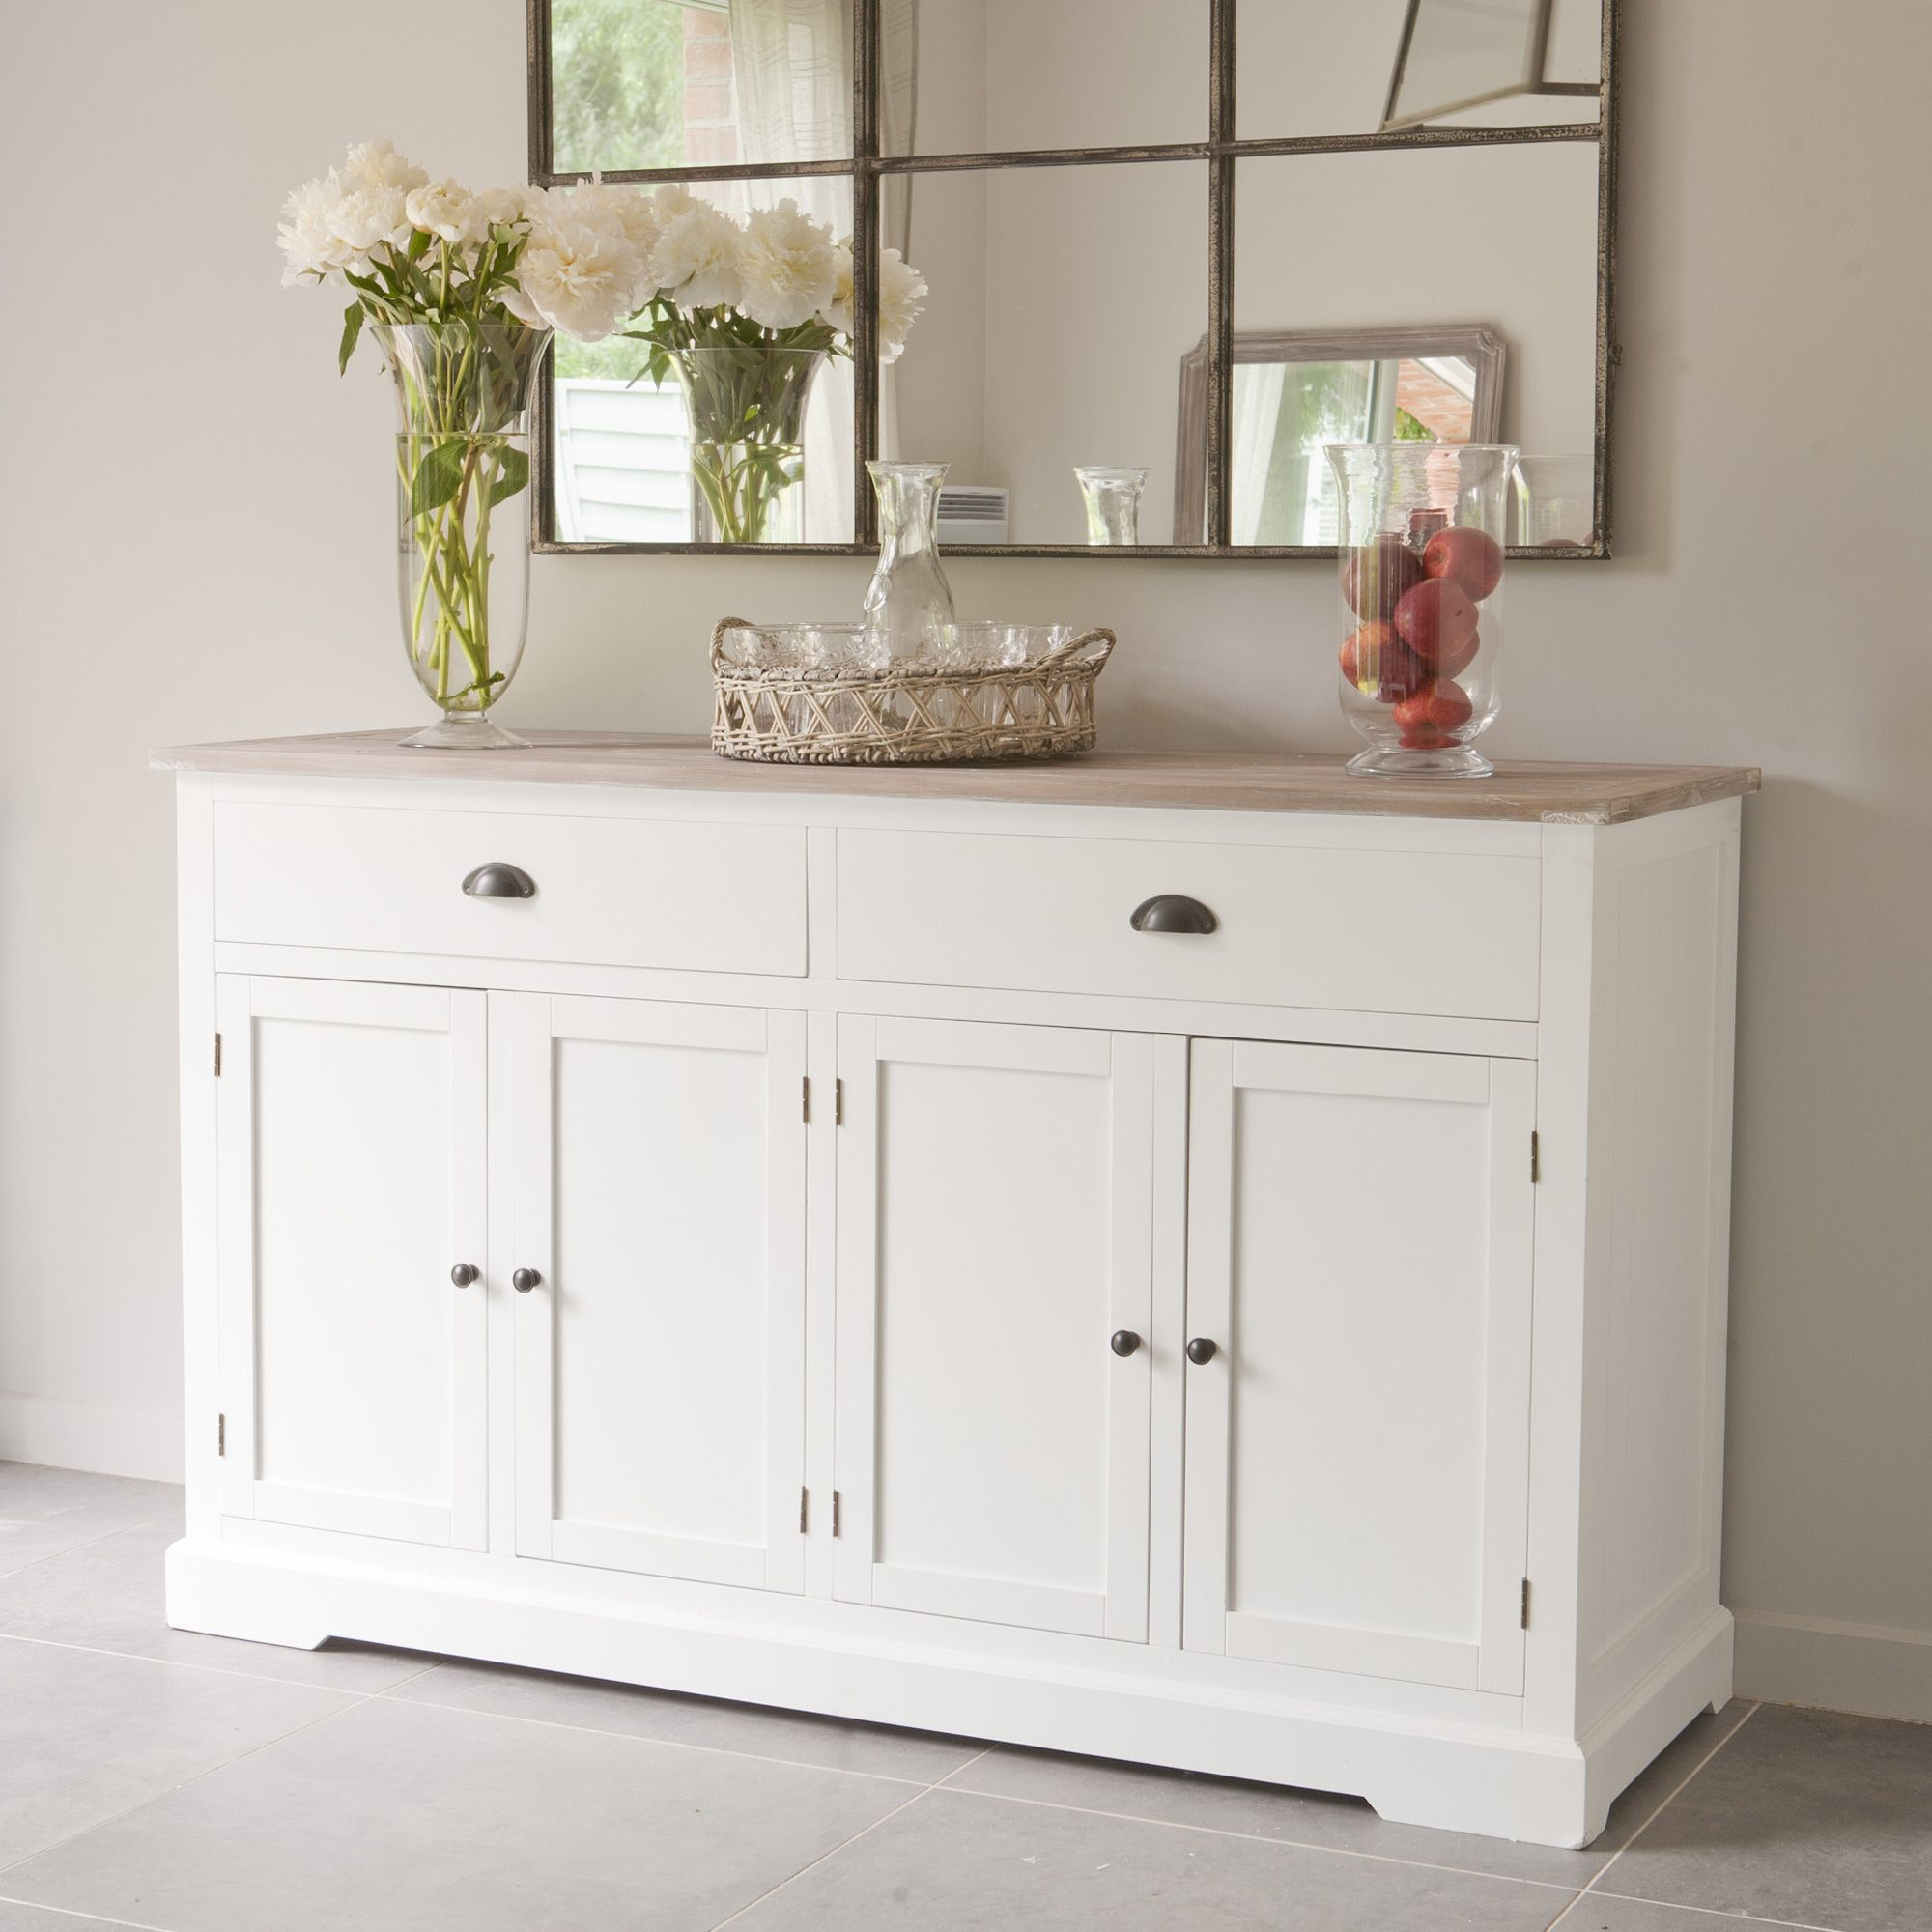 buffet 4 portes 2 tiroirs plateau en pin l150xp50xh90cm mathilde mathilde et pauline port offert. Black Bedroom Furniture Sets. Home Design Ideas